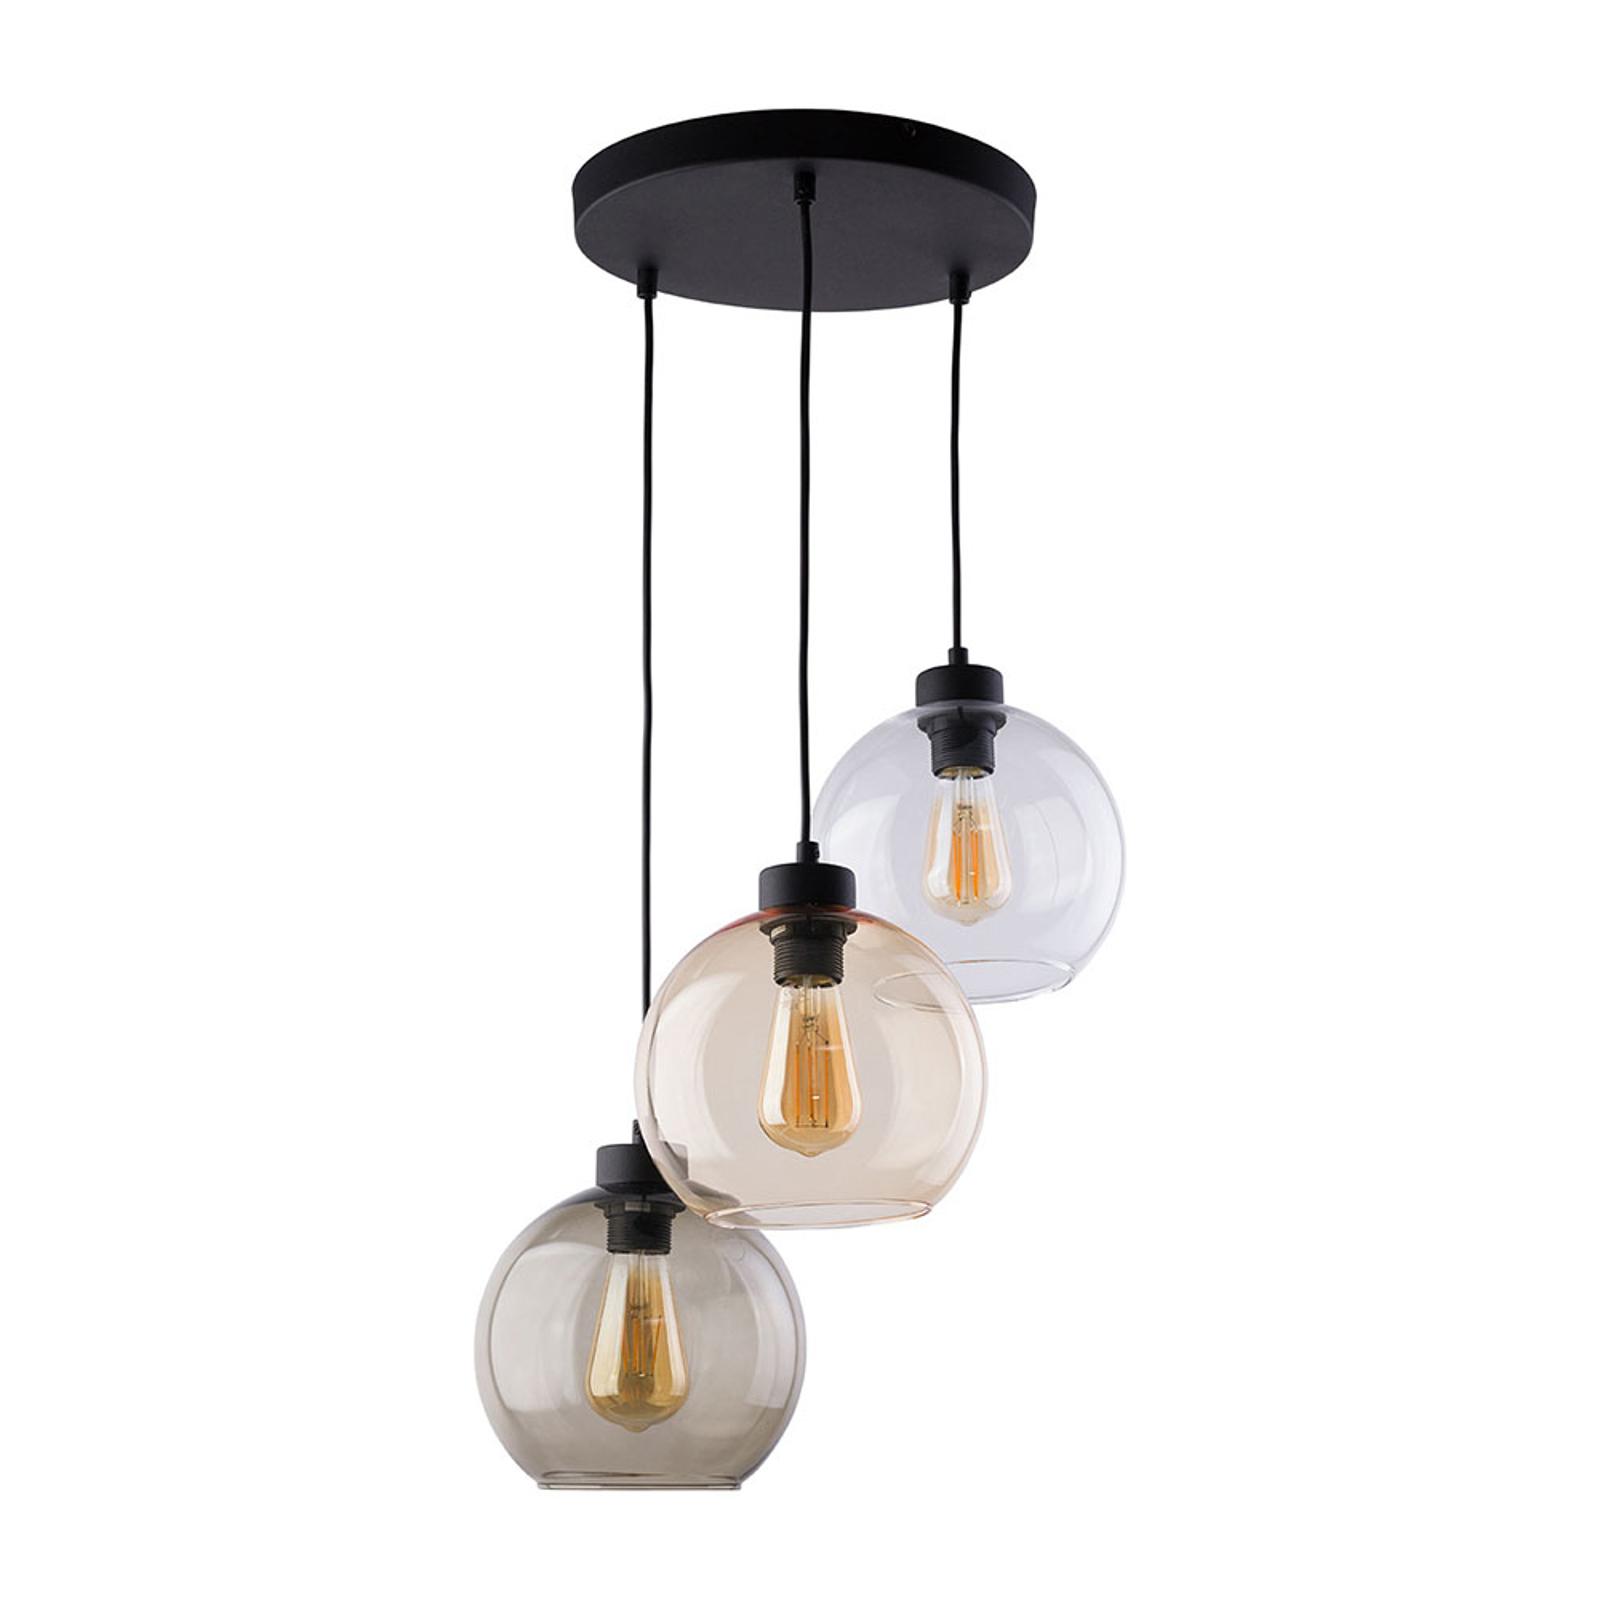 Suspension Cubus 3 lampes, transparente/miel/brune